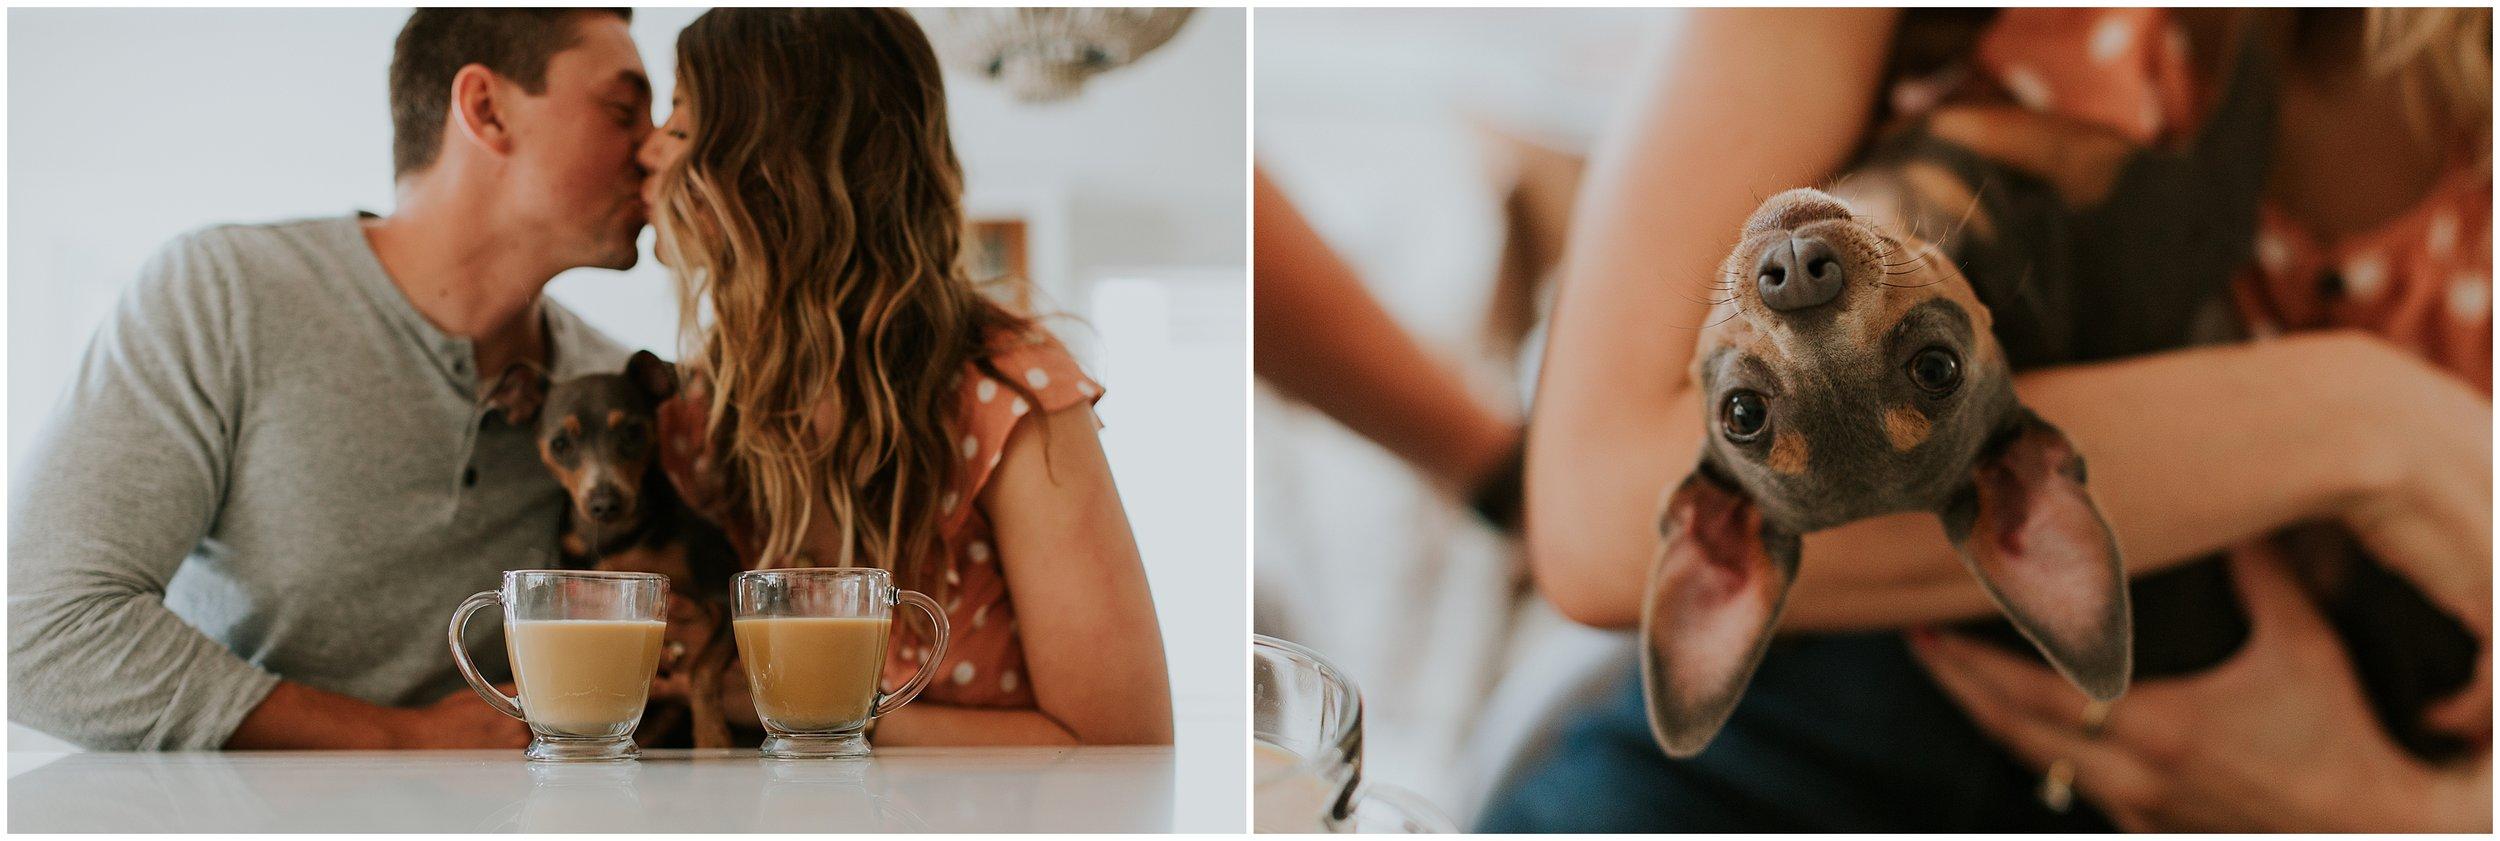 Madison Braun Photography | www.madisonbraunphotography.com | #engagement #lovers #inhomesession #inhome #bohophotographer #destinationweddingphotographer #travelphotographer #travelingphotographer #charlestonphotographer #bohophotographer #engagementphotographer #engagementsession #destinationwedding #destinationweddingphotographer #couple